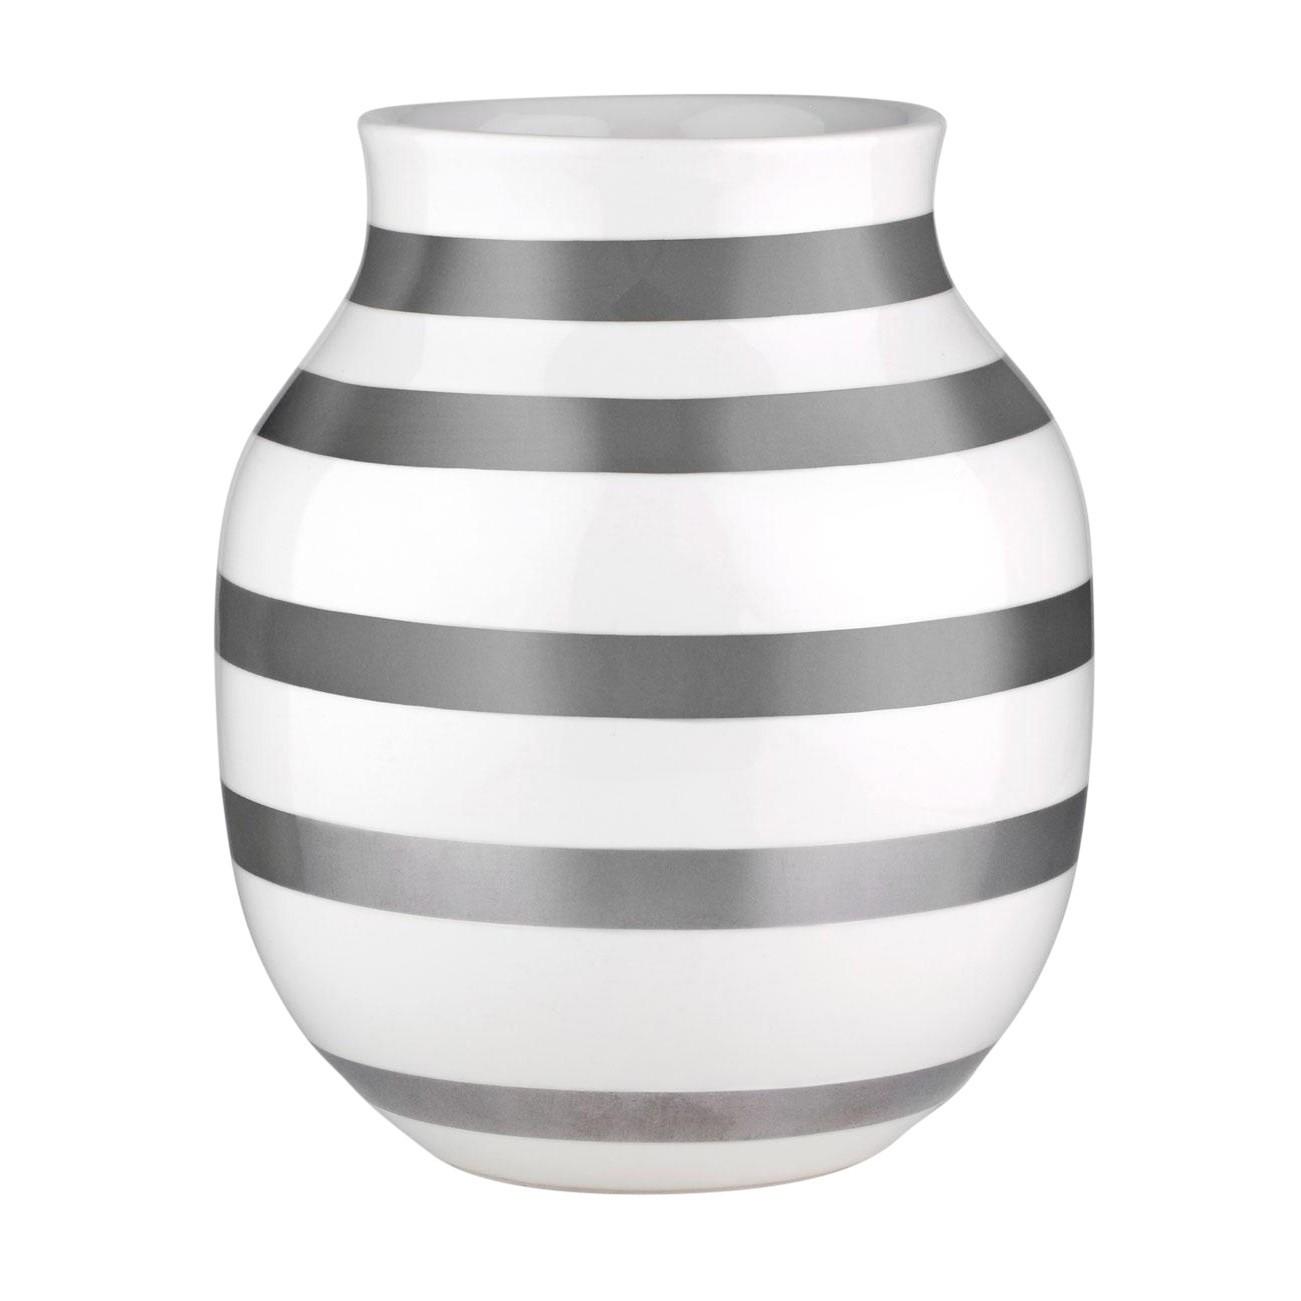 24 lead crystal vase value of ka¤hler omaggio vase h 20cm ambientedirect regarding kaehler omaggio vase h 20cm 1301x1301 id1921287 a5a6443d0dabe71acedaf537e483024e